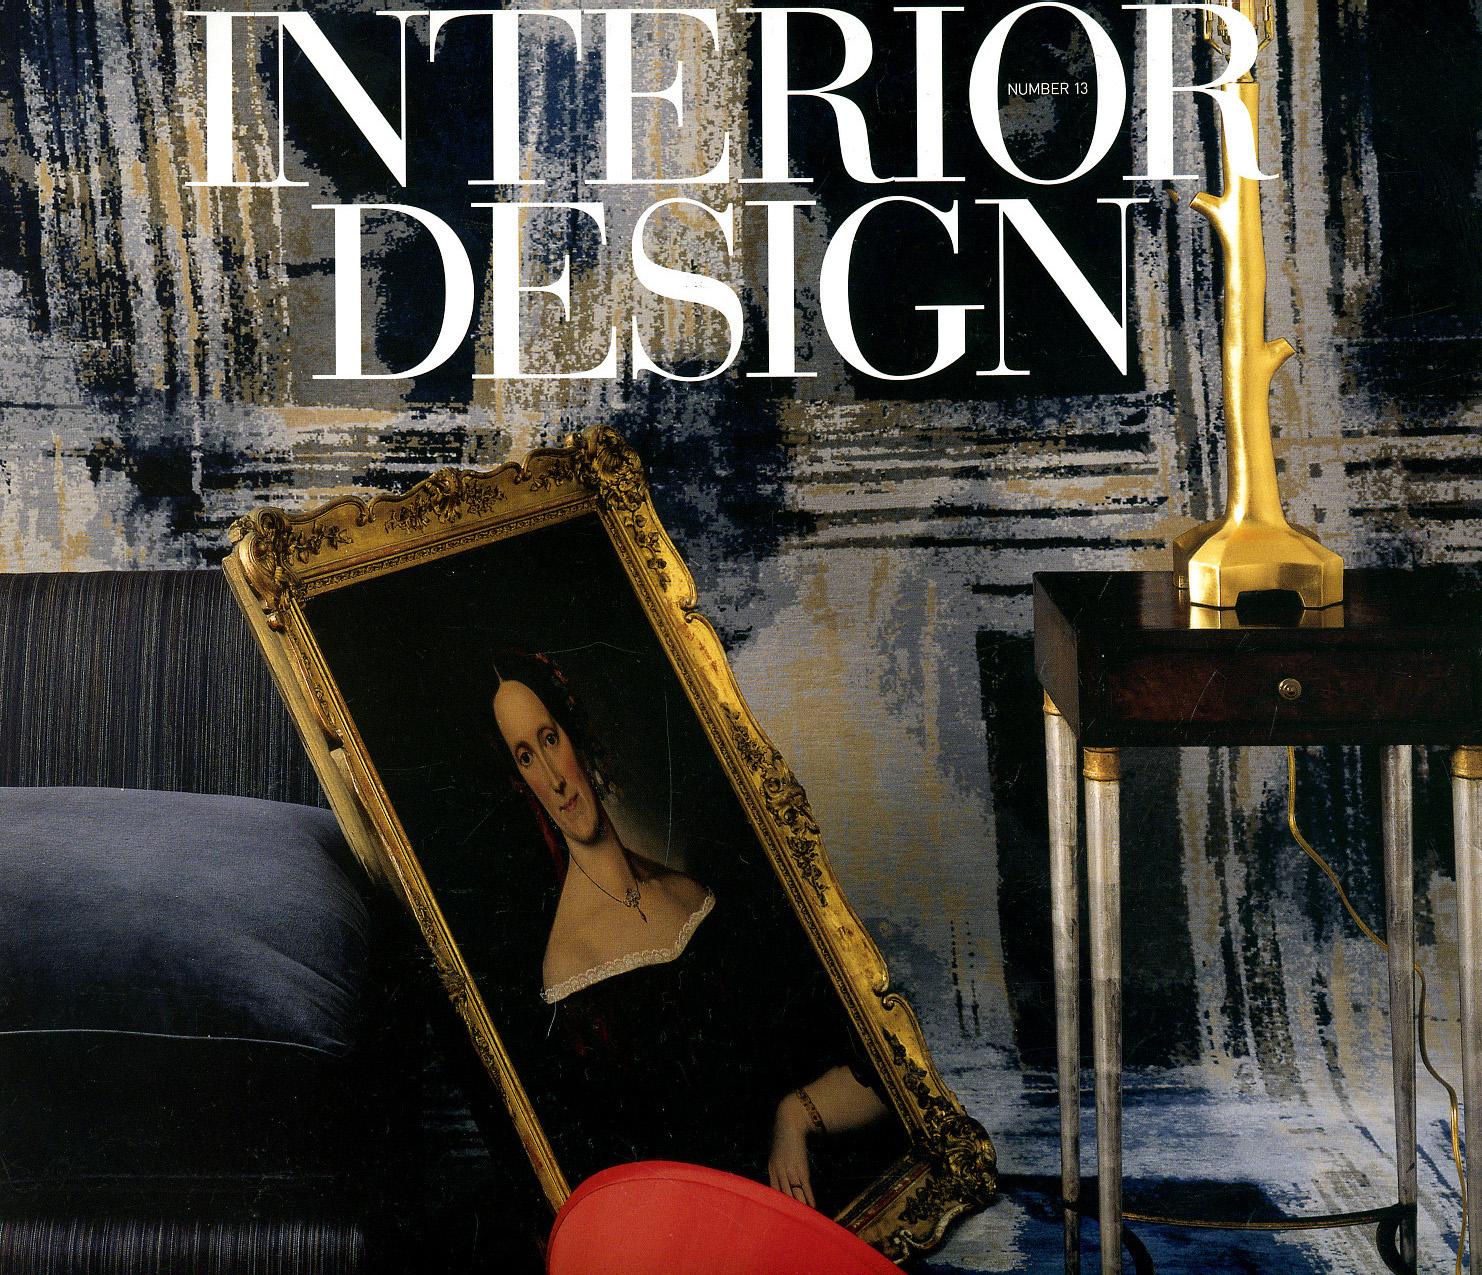 interiordesign.mp1.cover.jpg